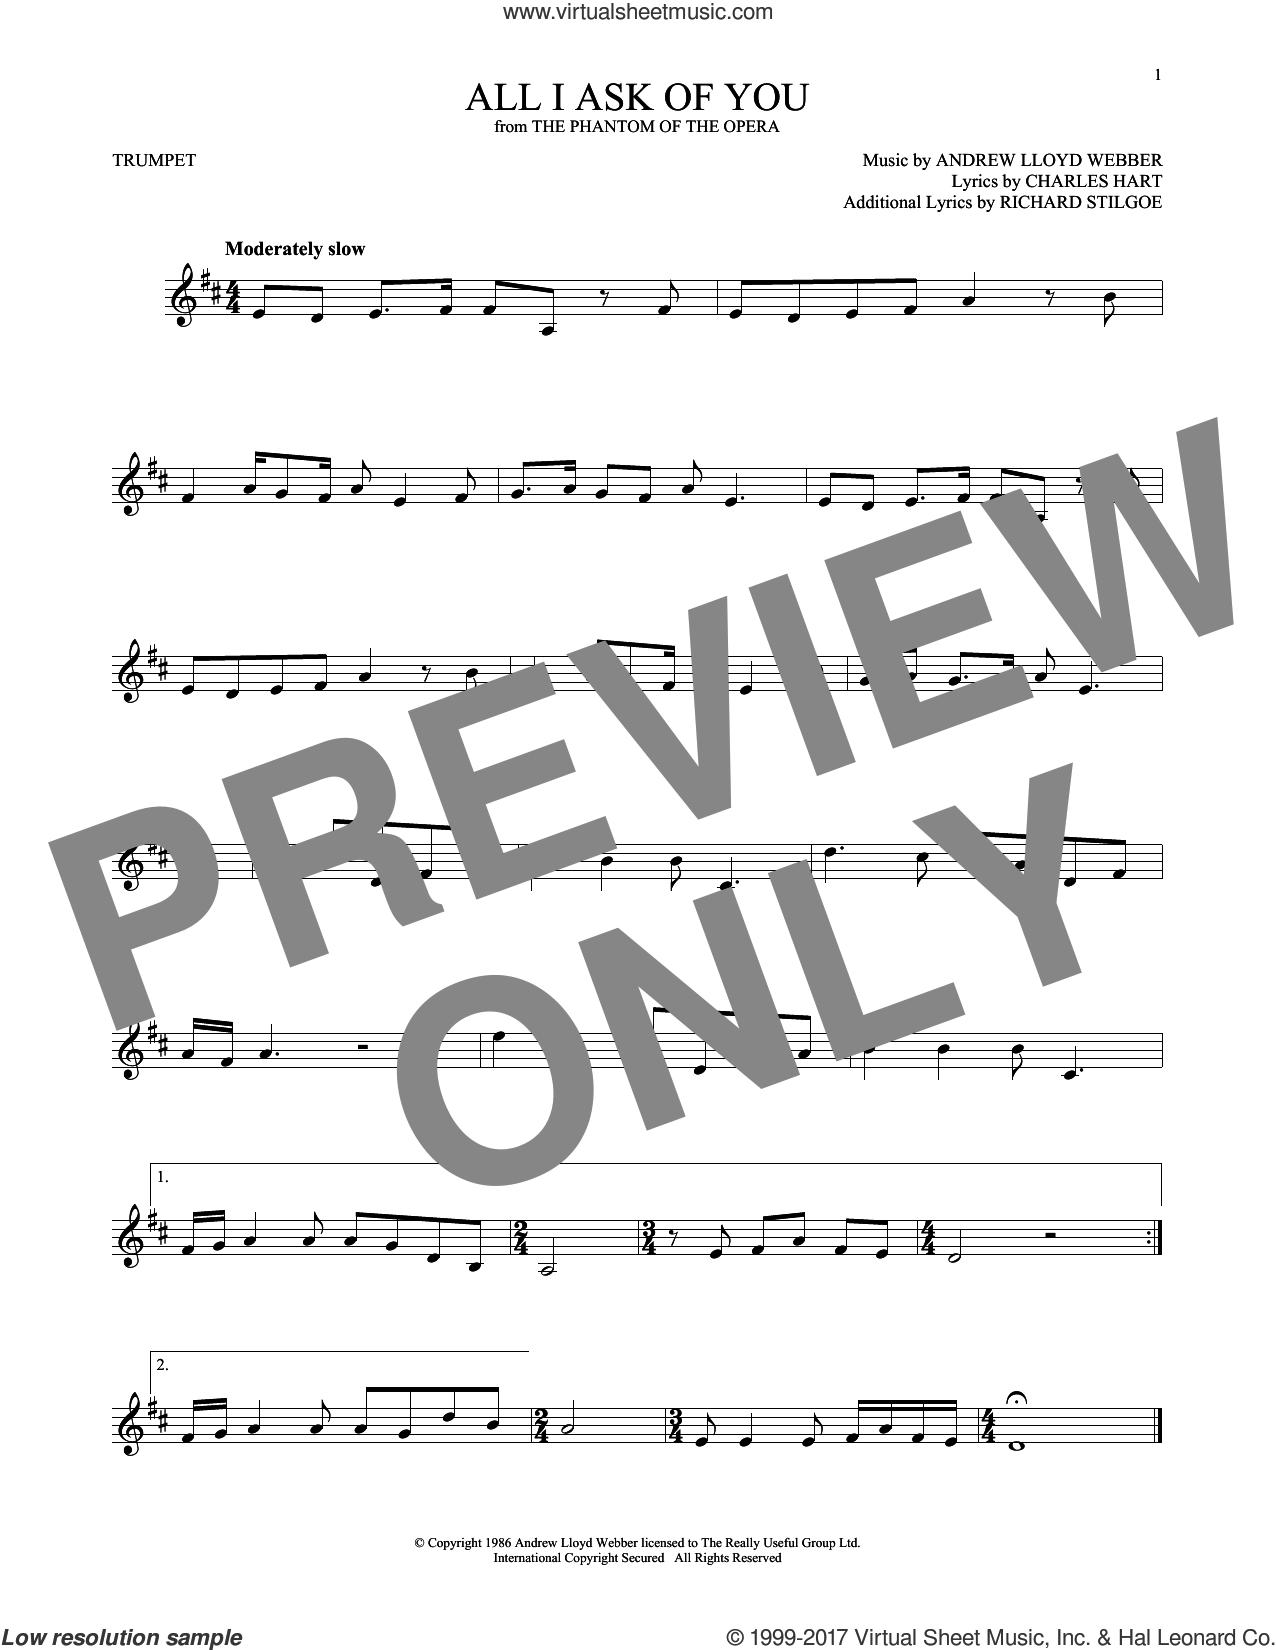 All I Ask Of You (from The Phantom Of The Opera) sheet music for trumpet solo by Andrew Lloyd Webber, Barbra Streisand, Charles Hart and Richard Stilgoe, intermediate skill level